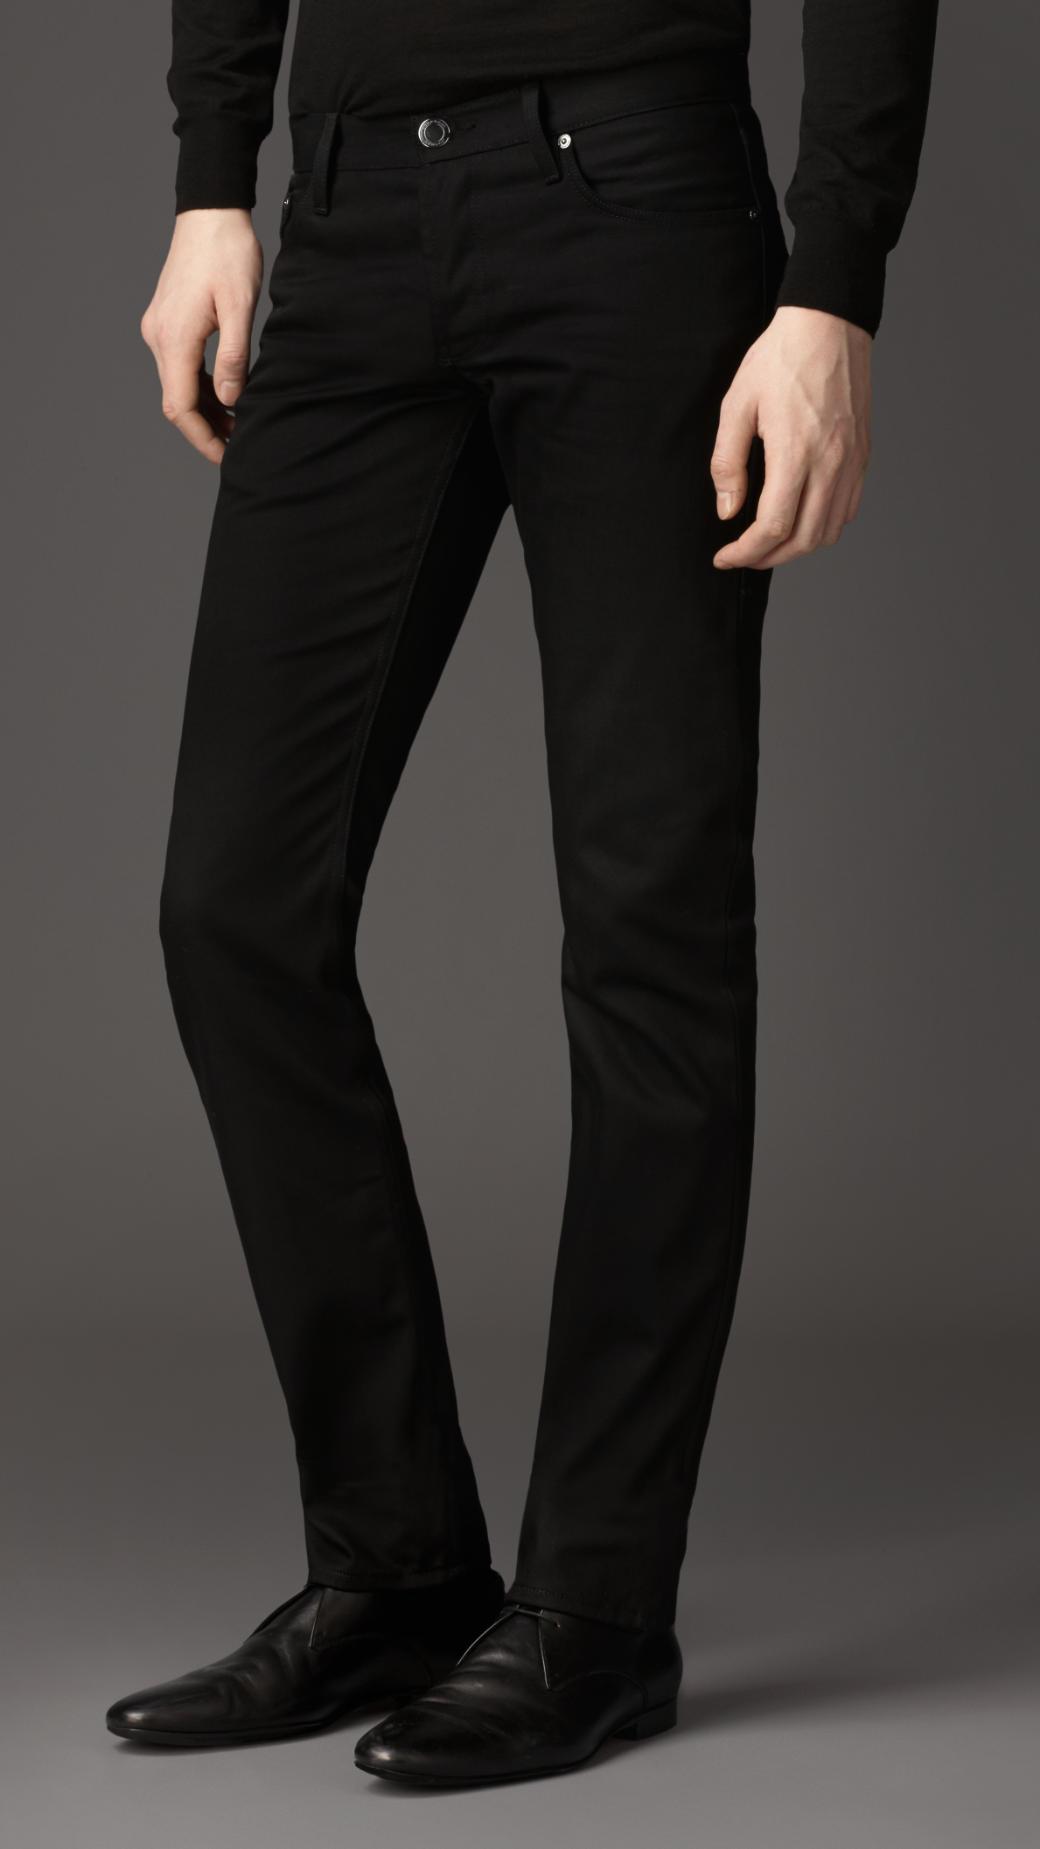 61934529 Burberry Steadman Black Slim Fit Jeans in Black for Men - Lyst